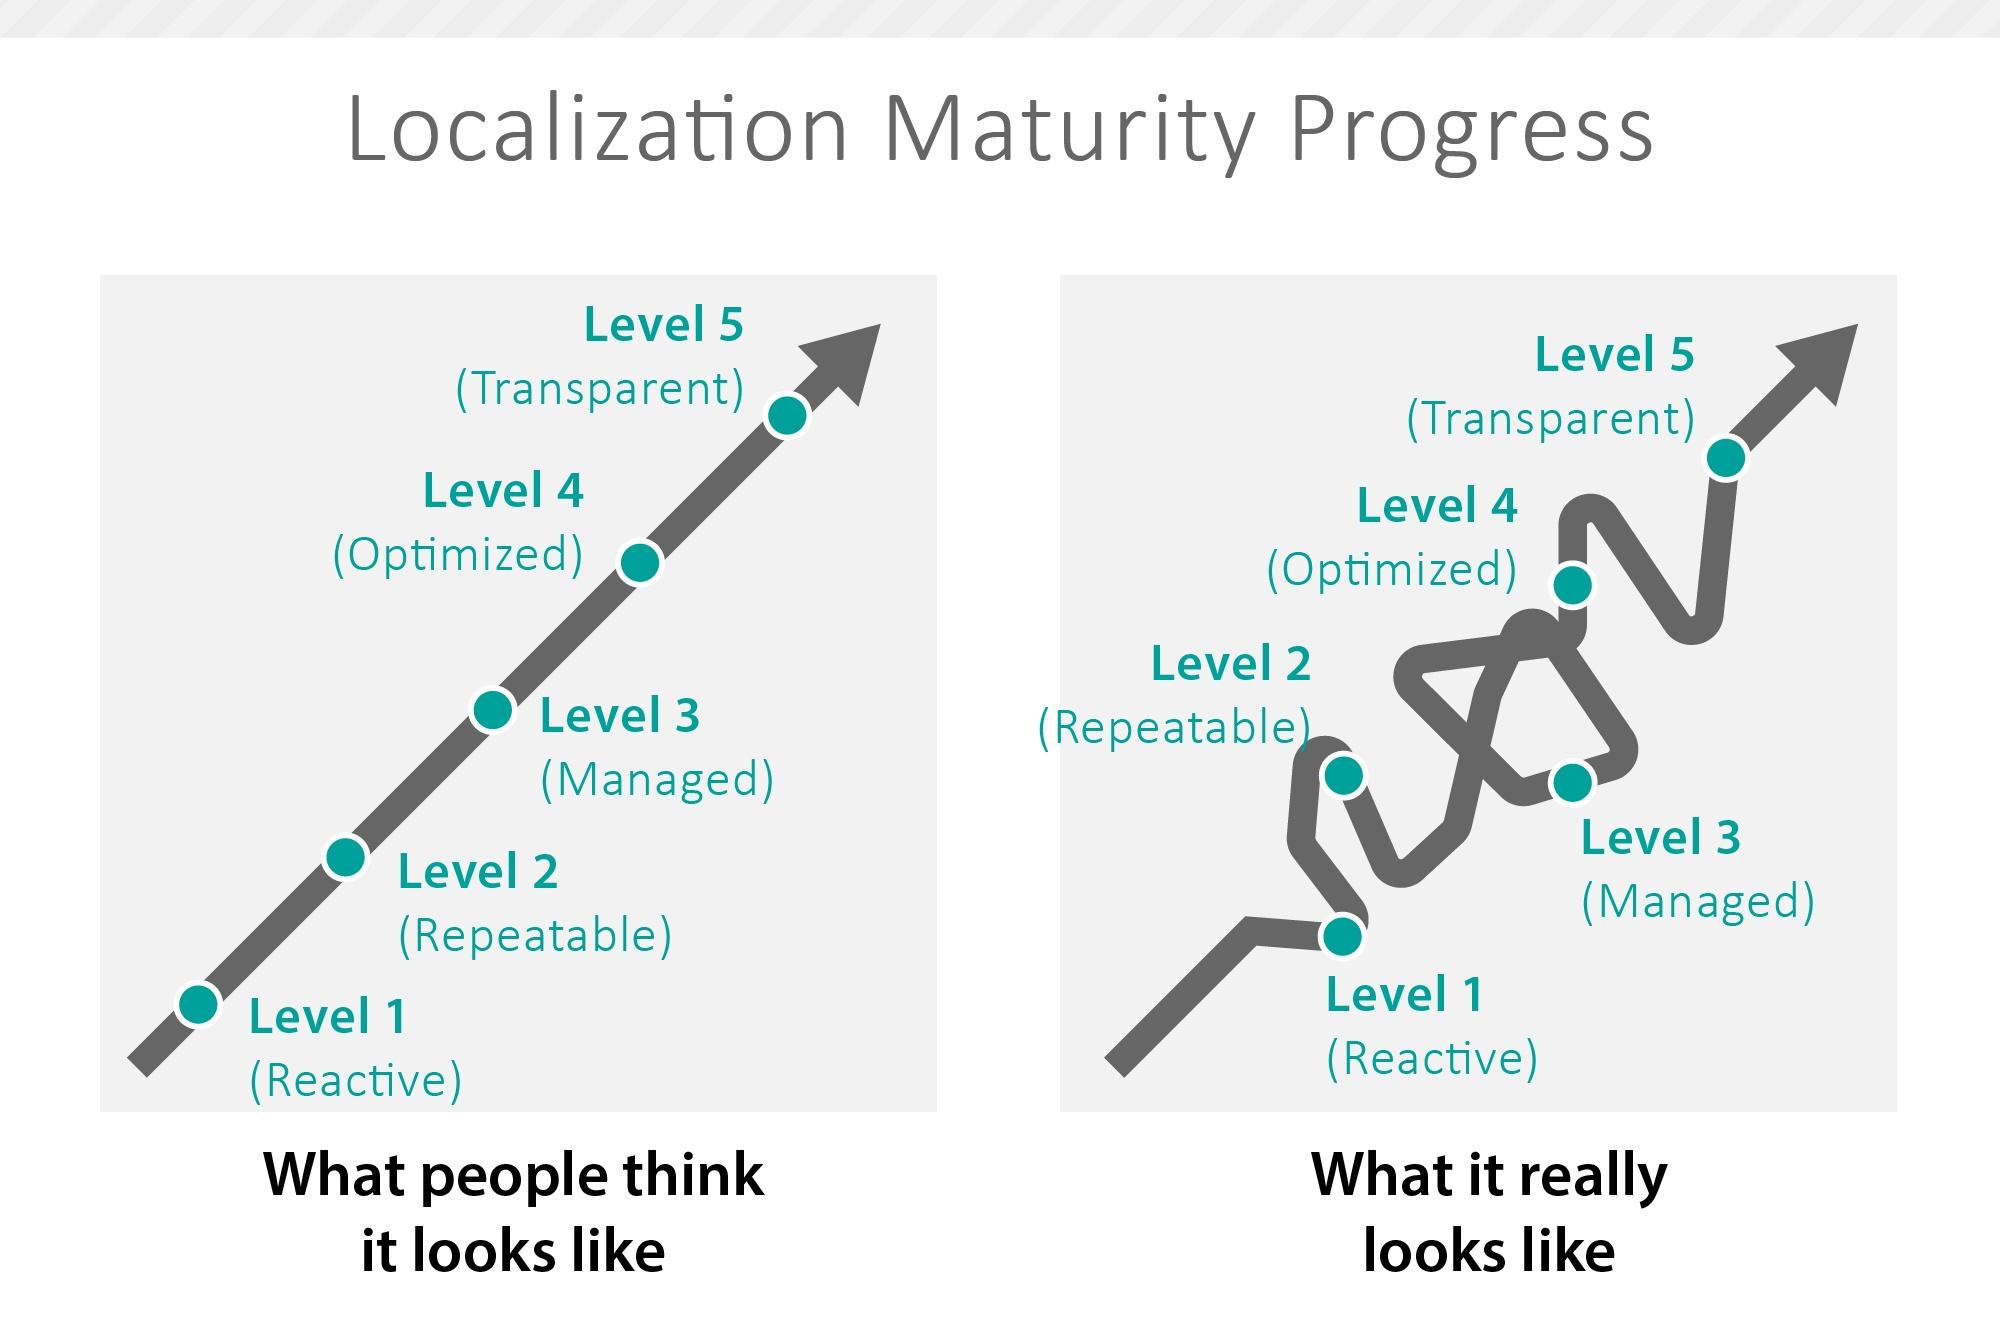 Shuffle between localization maturity levels